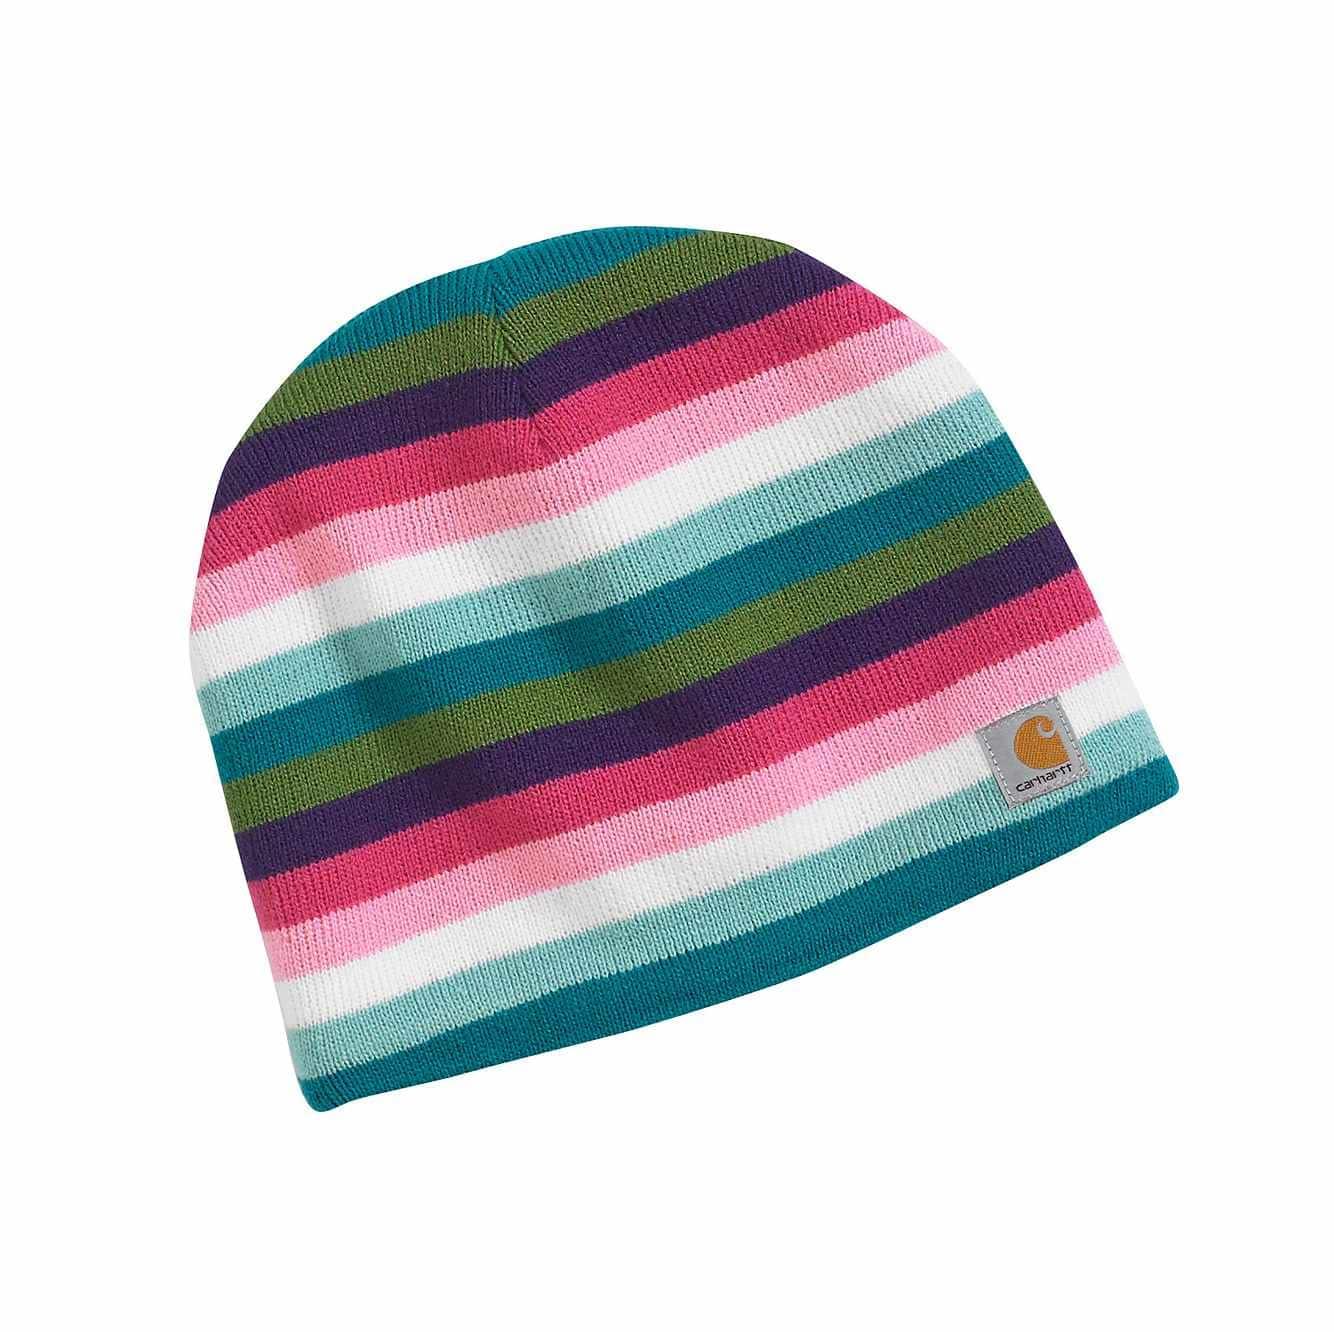 Picture of Multi Stripe Hat in Rose Bloom